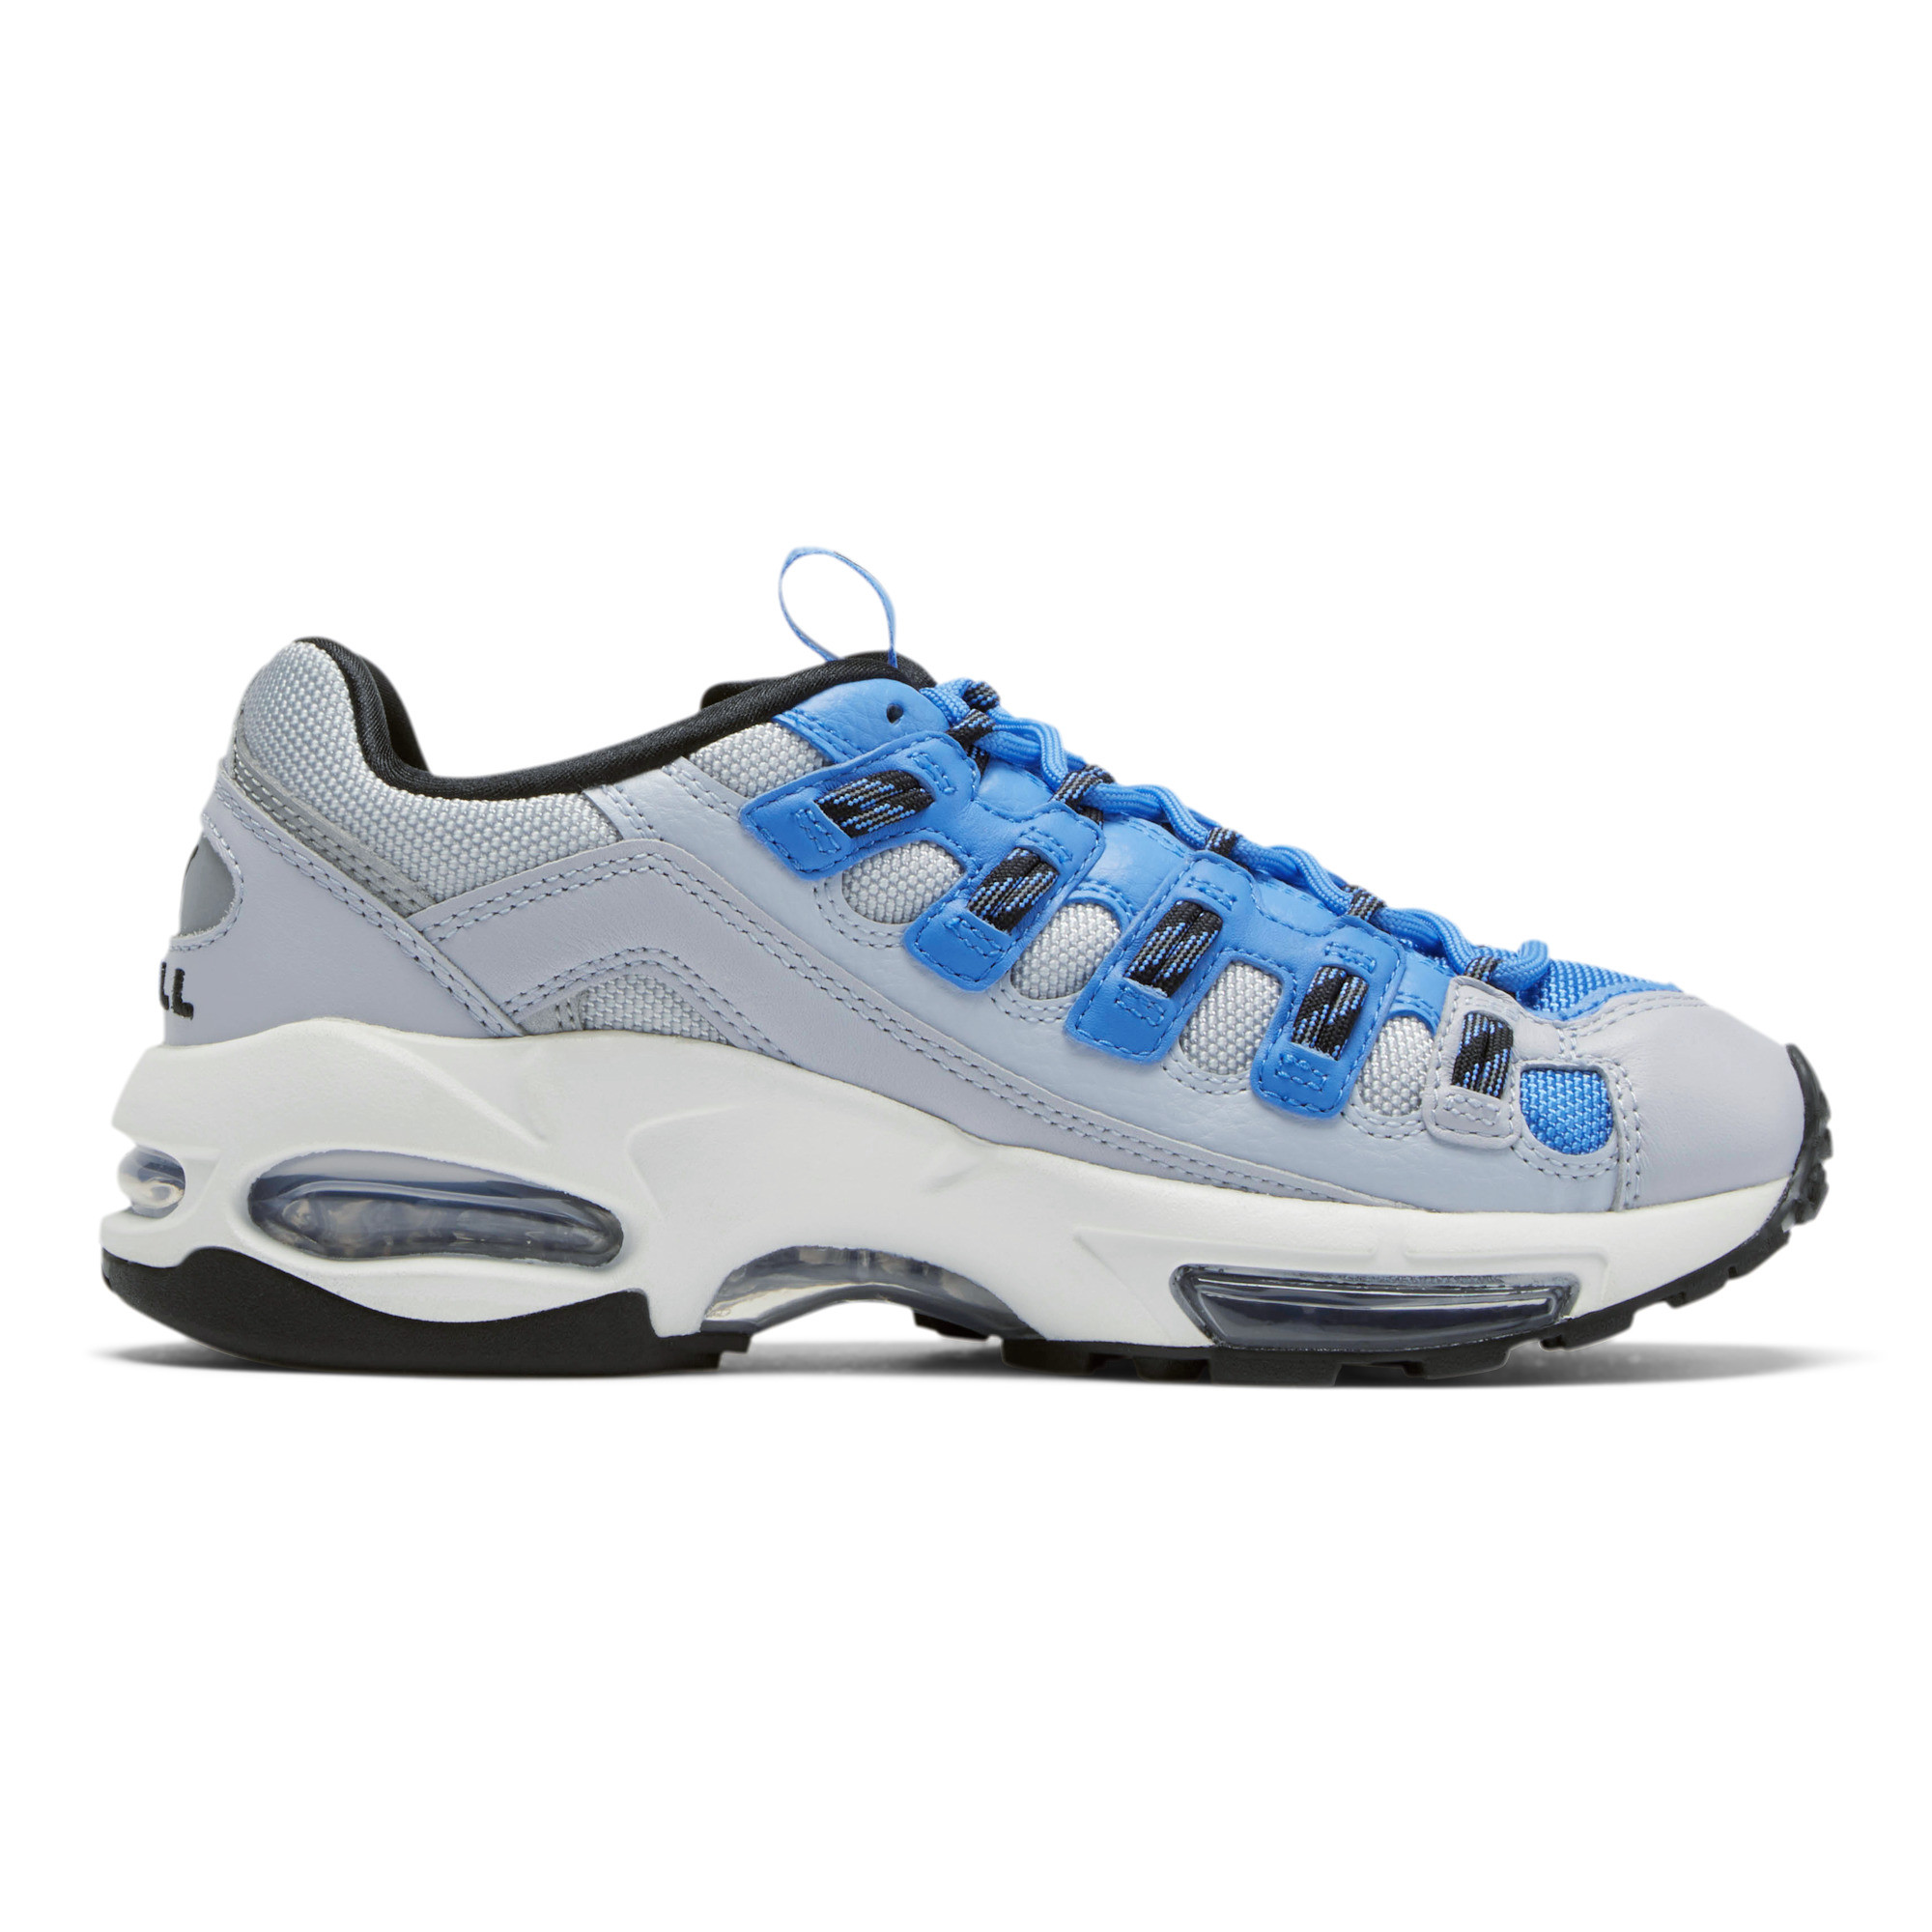 PUMA-CELL-Endura-Rebound-Women-039-s-Sneakers-Women-Shoe-Sport-Classics thumbnail 6